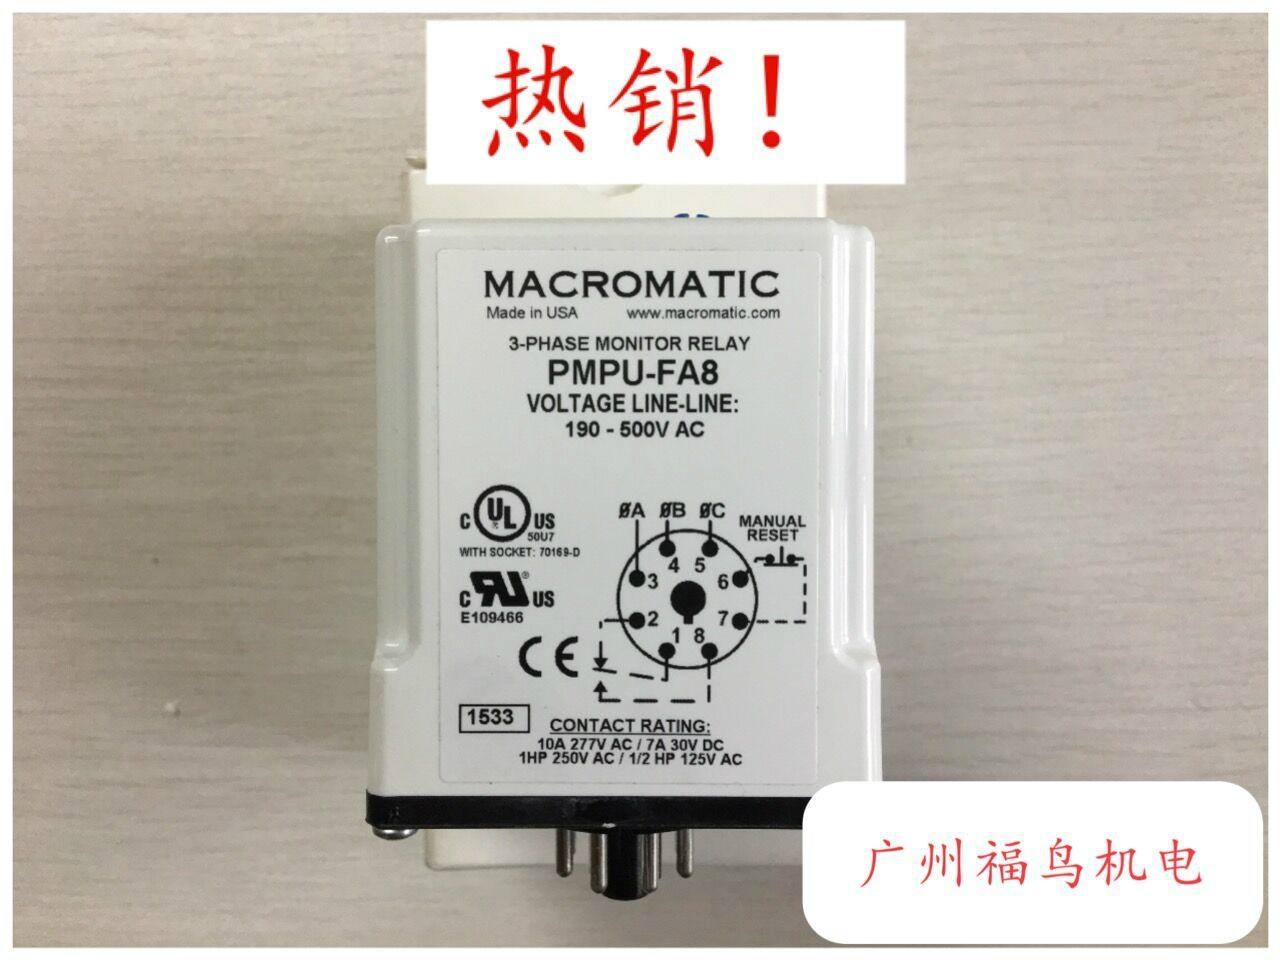 MACROMATIC控制繼電器, 型號: PMPU-FA8